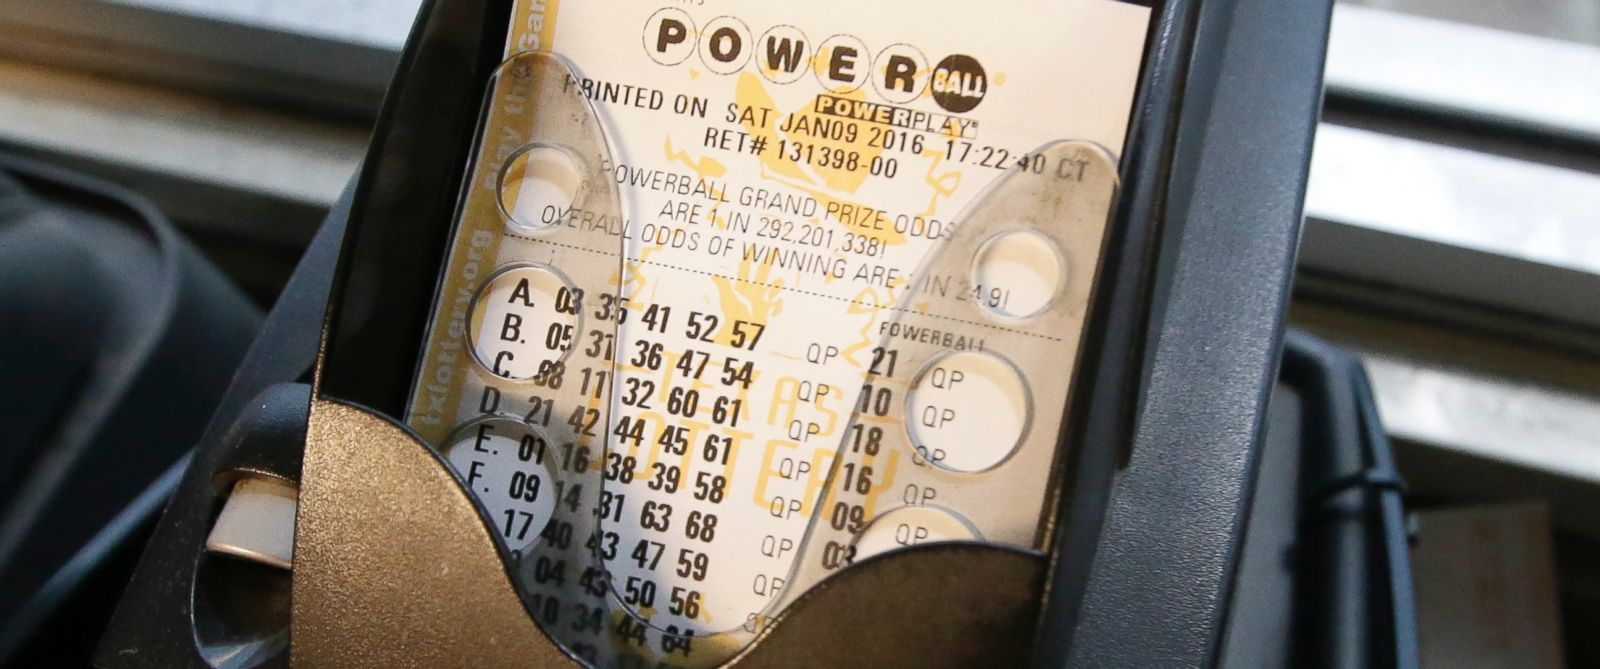 Lotto Quick Pick Results